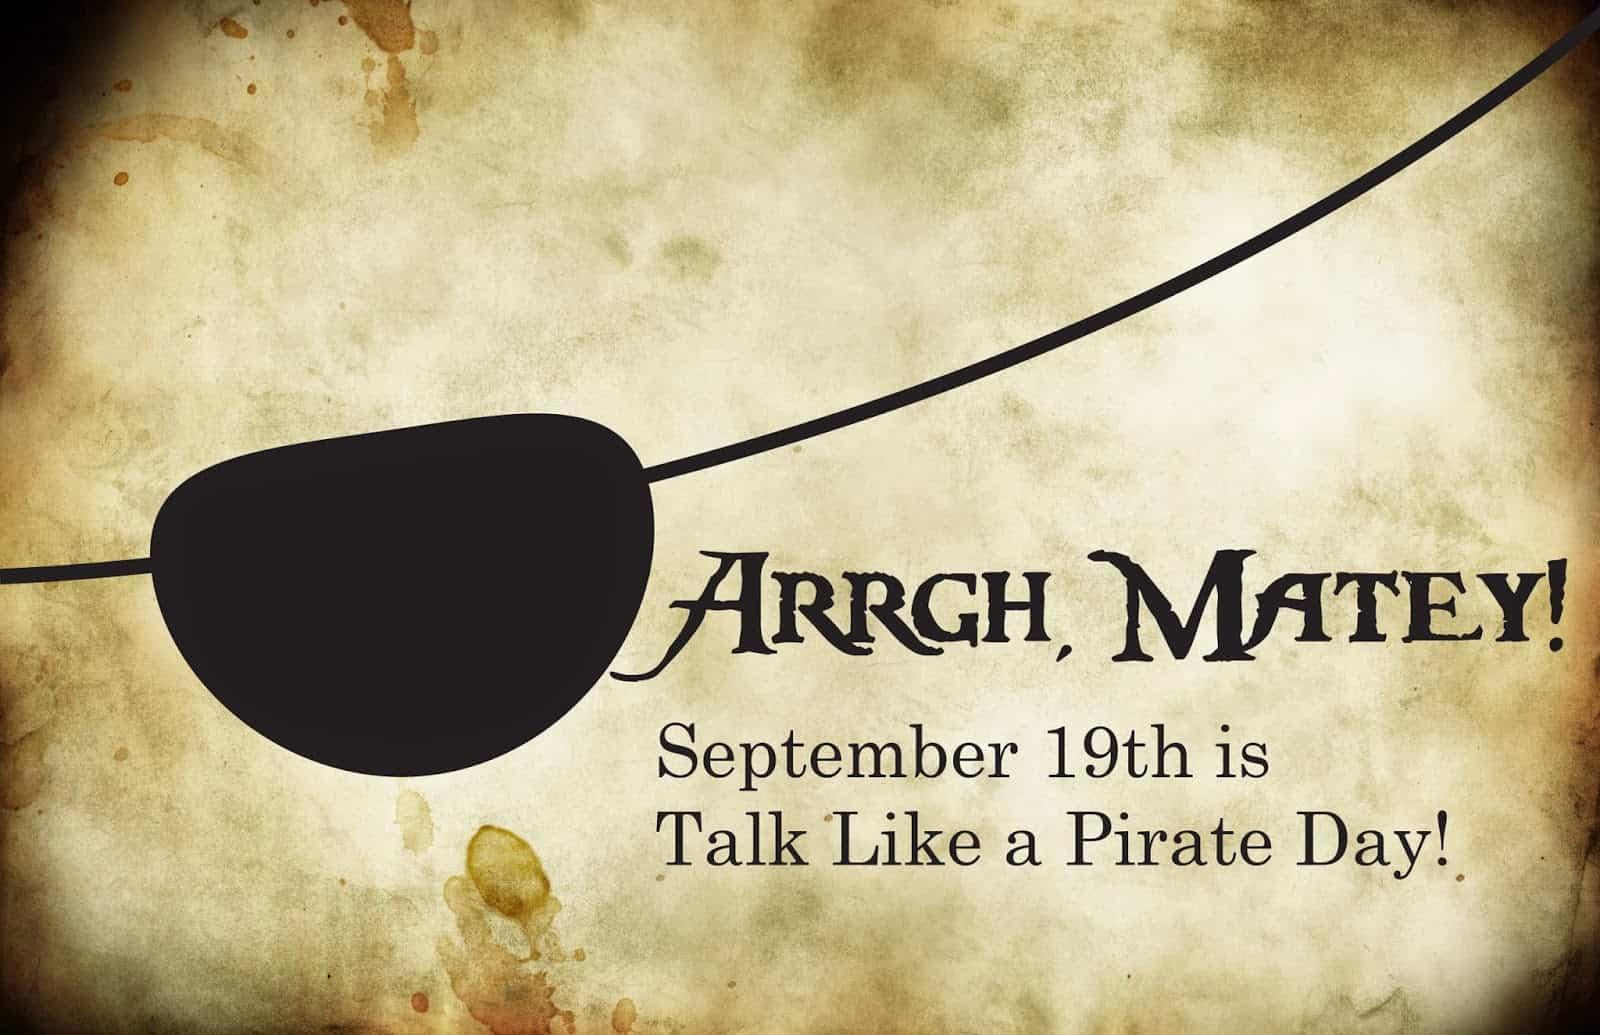 International Talk like a Pirate Day - National Awareness Days Calendar 2021